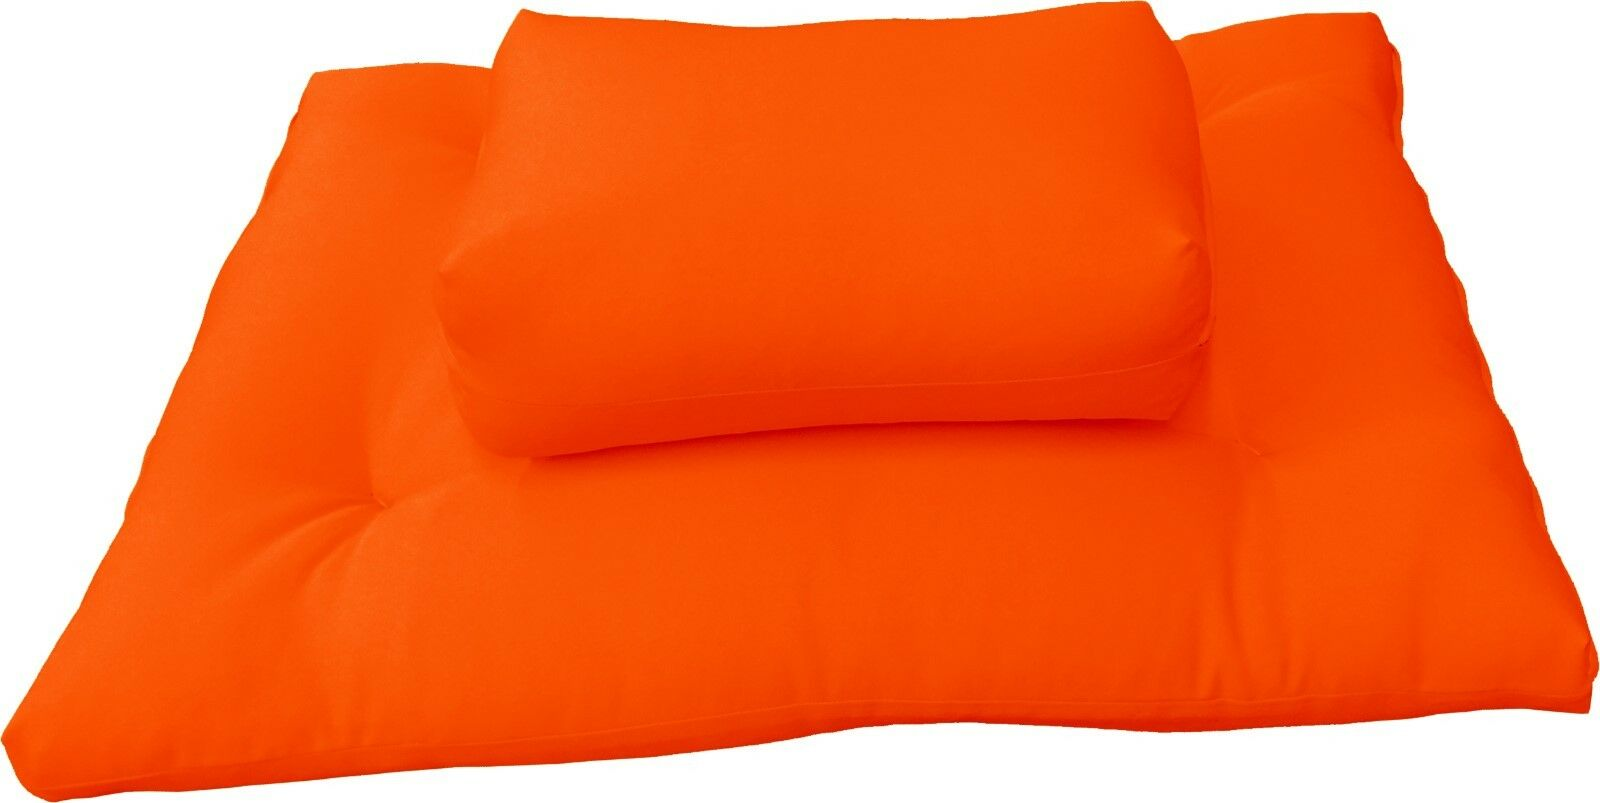 orange Zabuton Zafu Set, Yoga Meditation Cushions, Floor Sitting Seats, Kneel